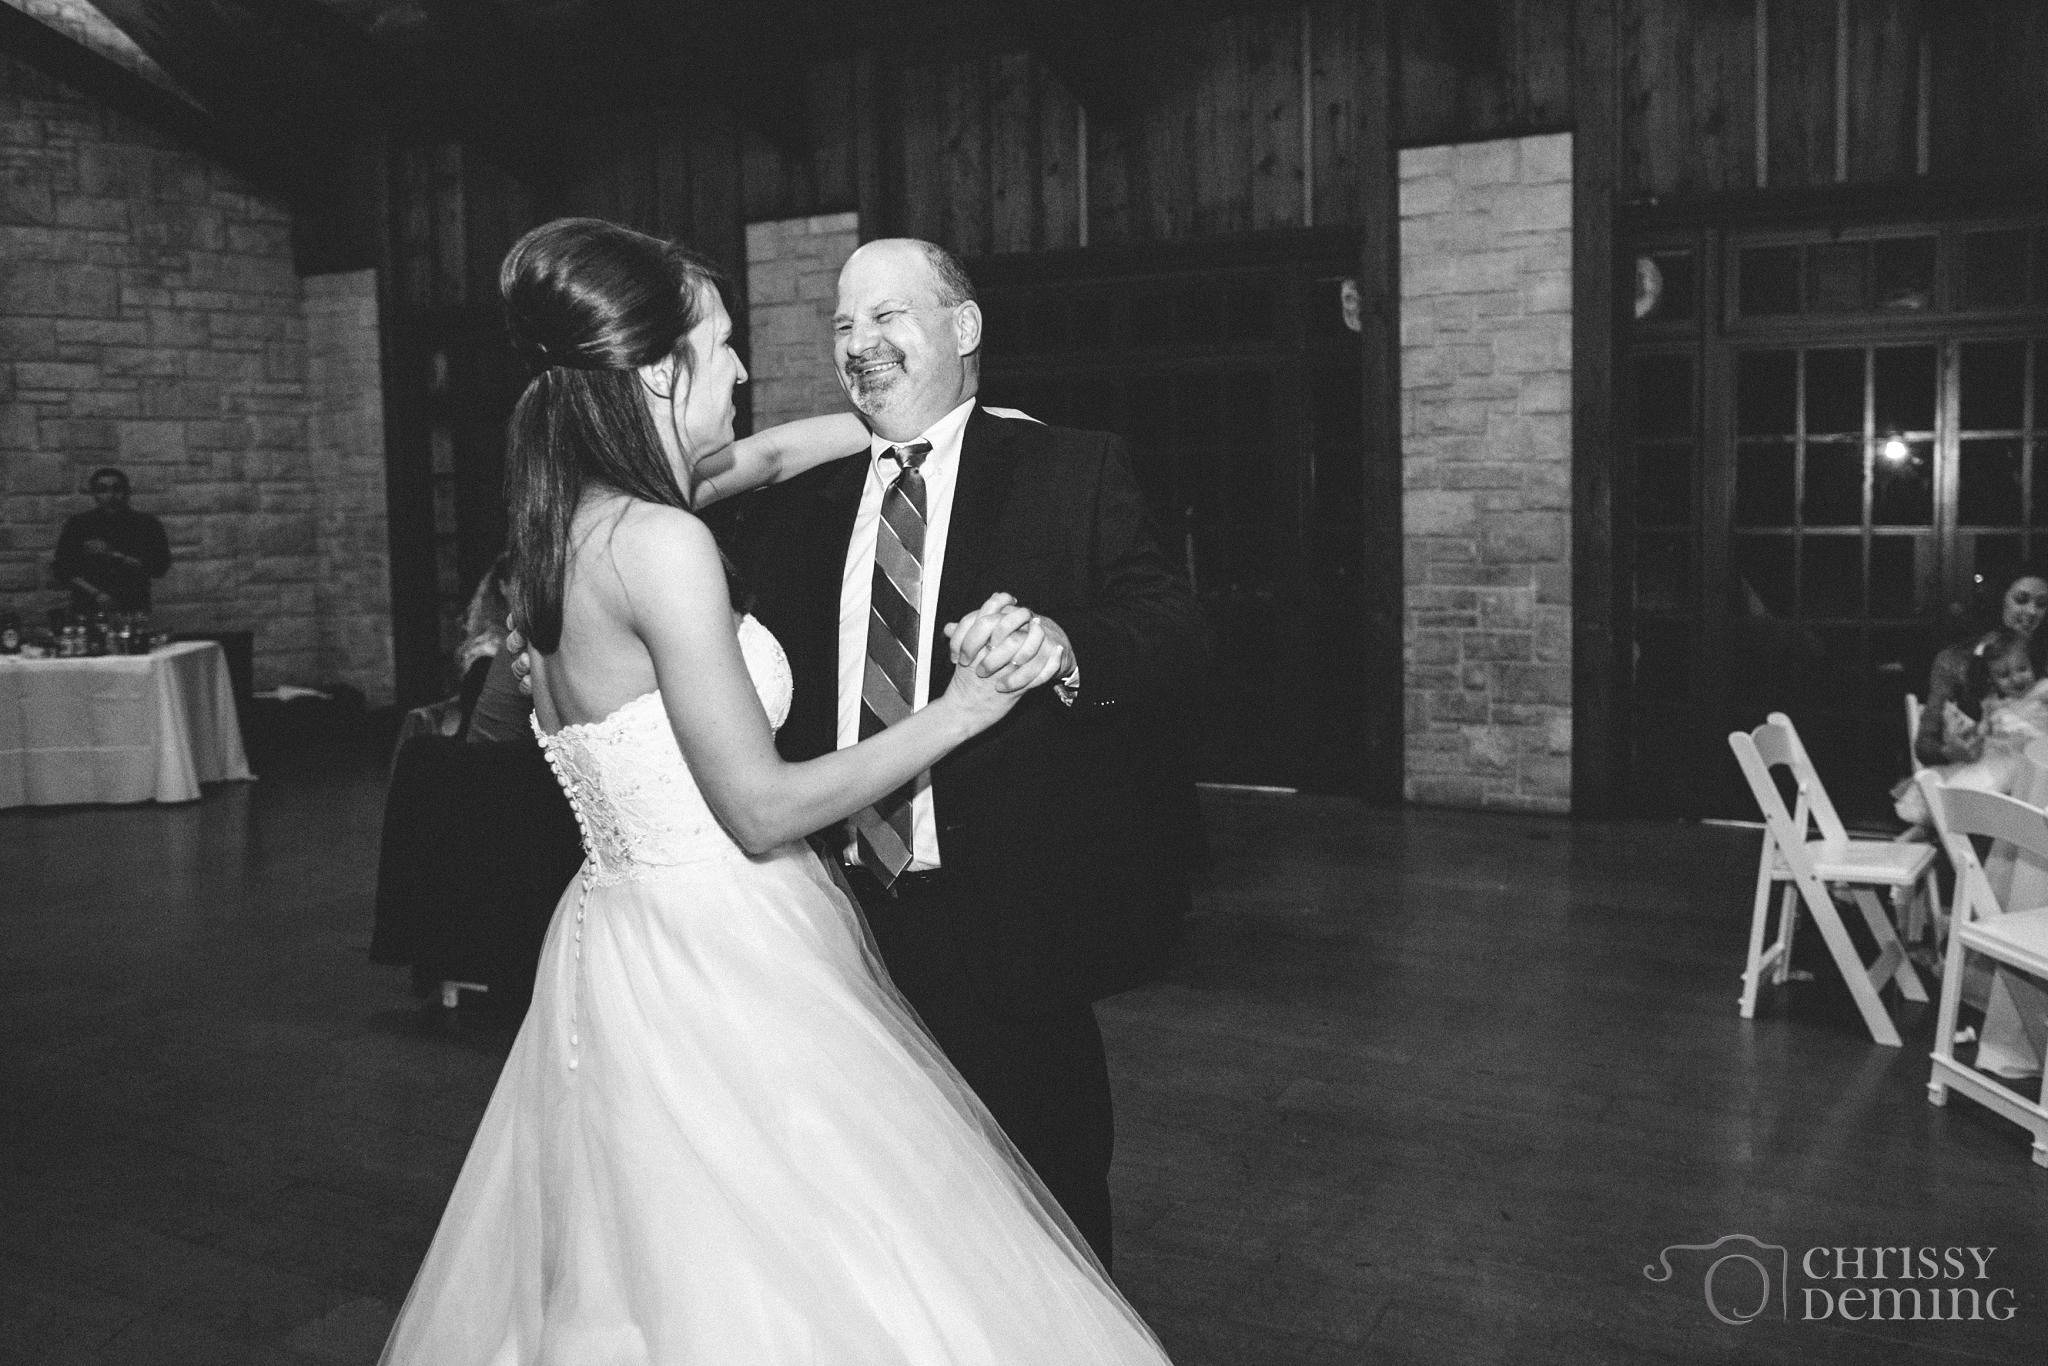 promontory_point_chicago_wedding_photography_0034.jpg